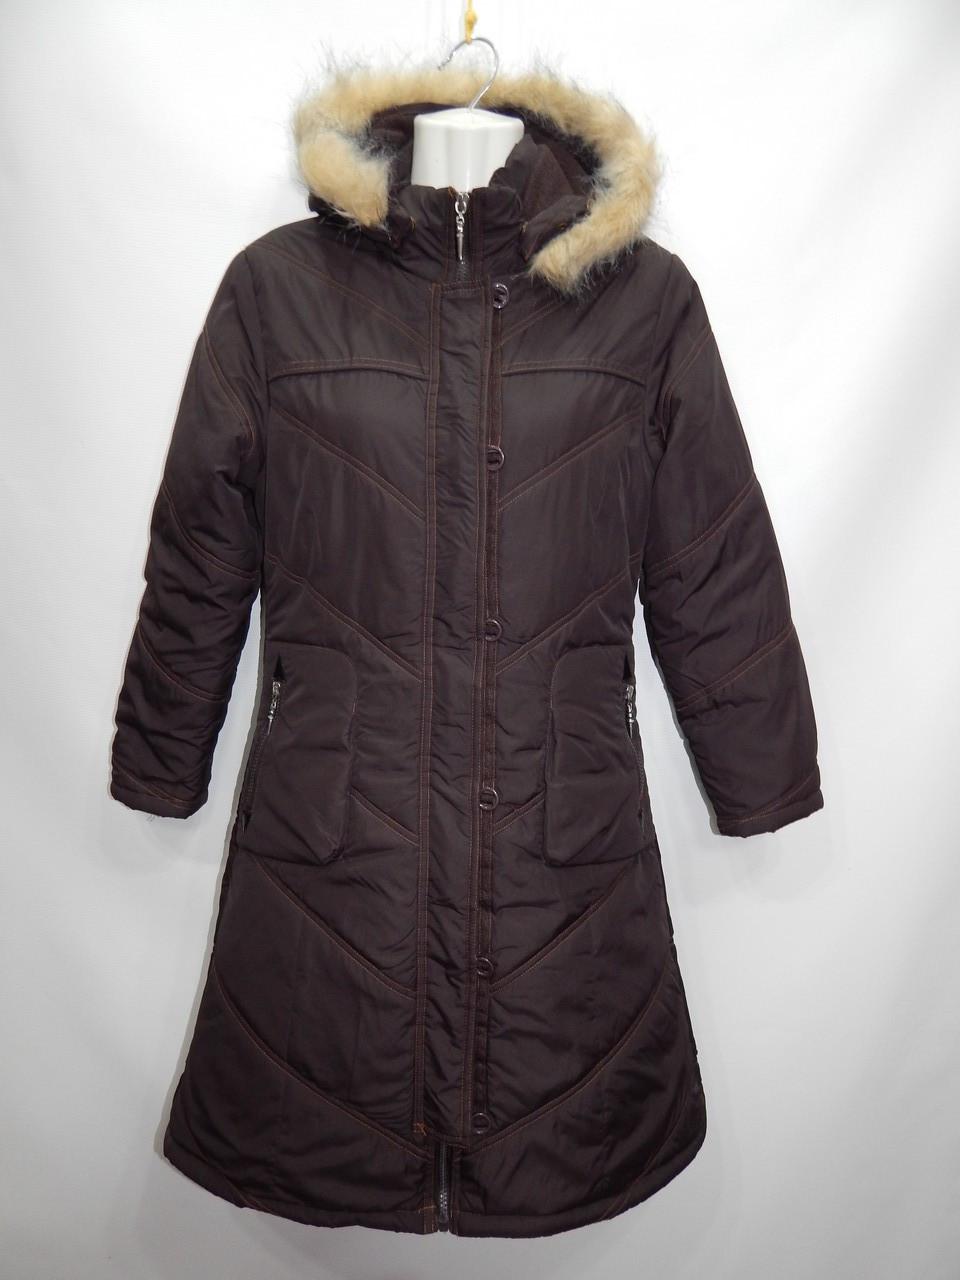 Куртка - пальто  женская утепленная с капюшоном HIKIS  (сток)  р.38-40 006GK